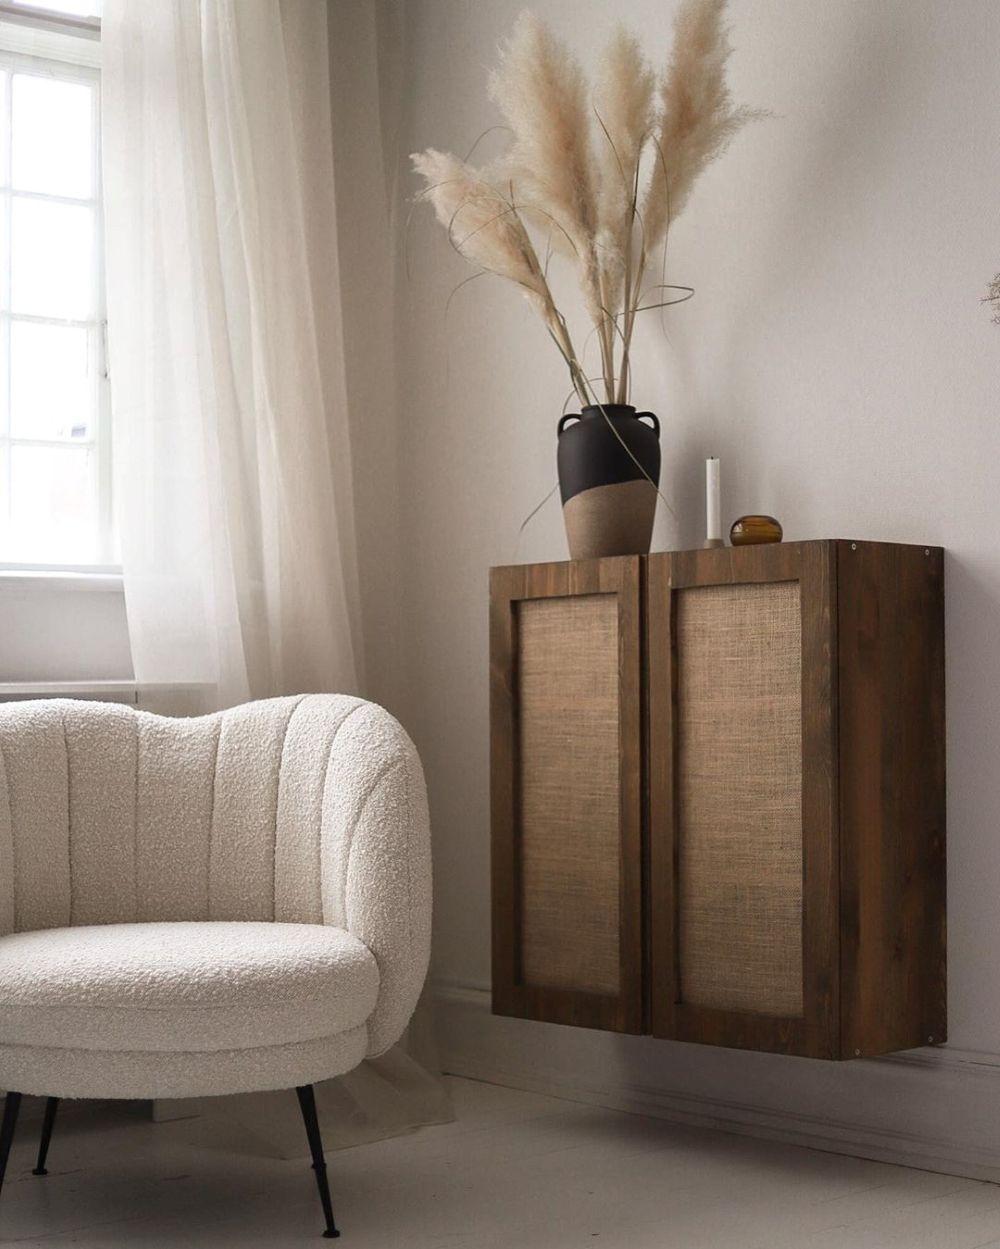 9 Seriously Stylish IKEA IVAR Cabinet Hacks, That Won't break the Bank! • Grillo Designs